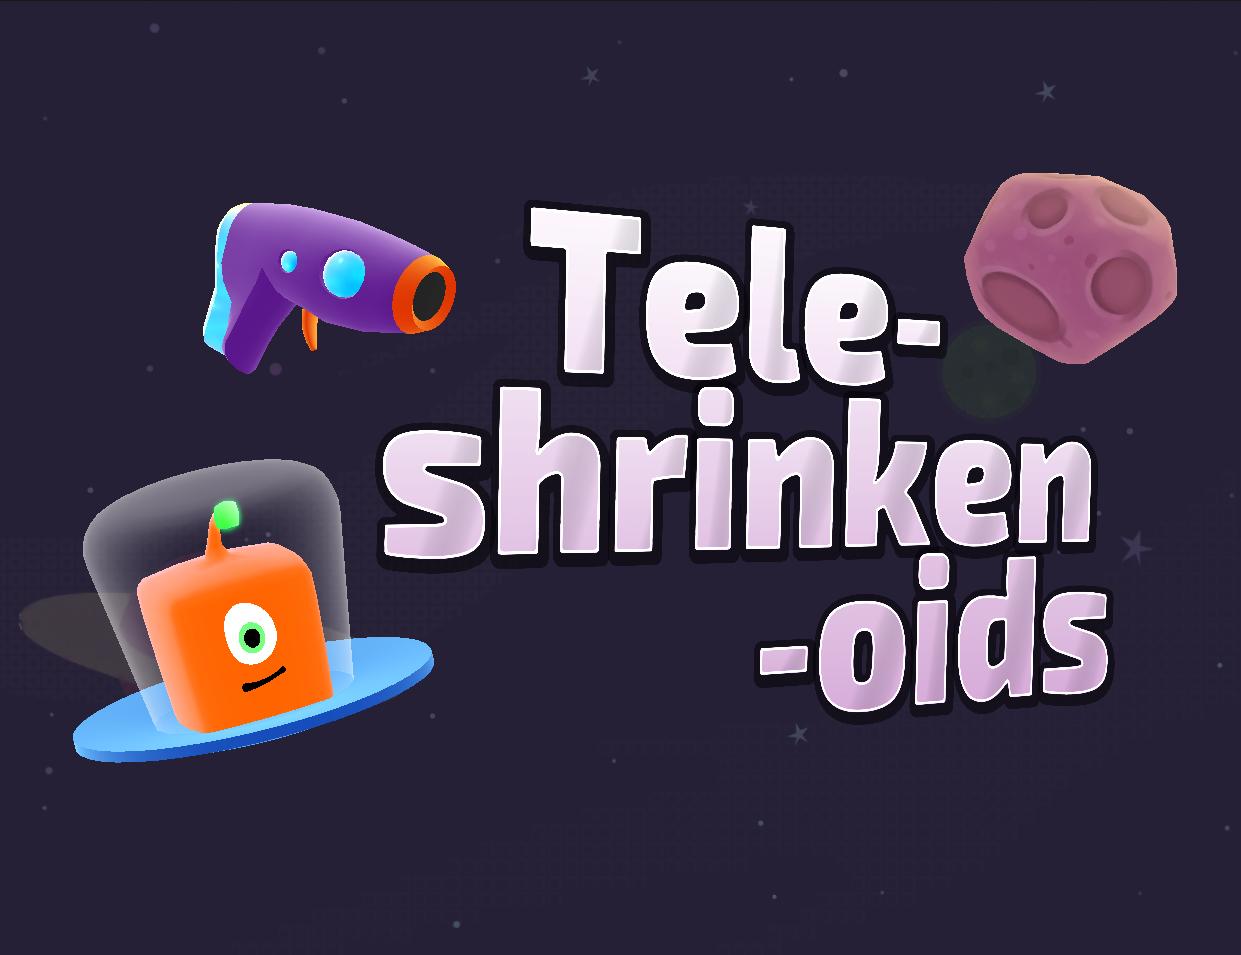 Tele-shrinken-oids